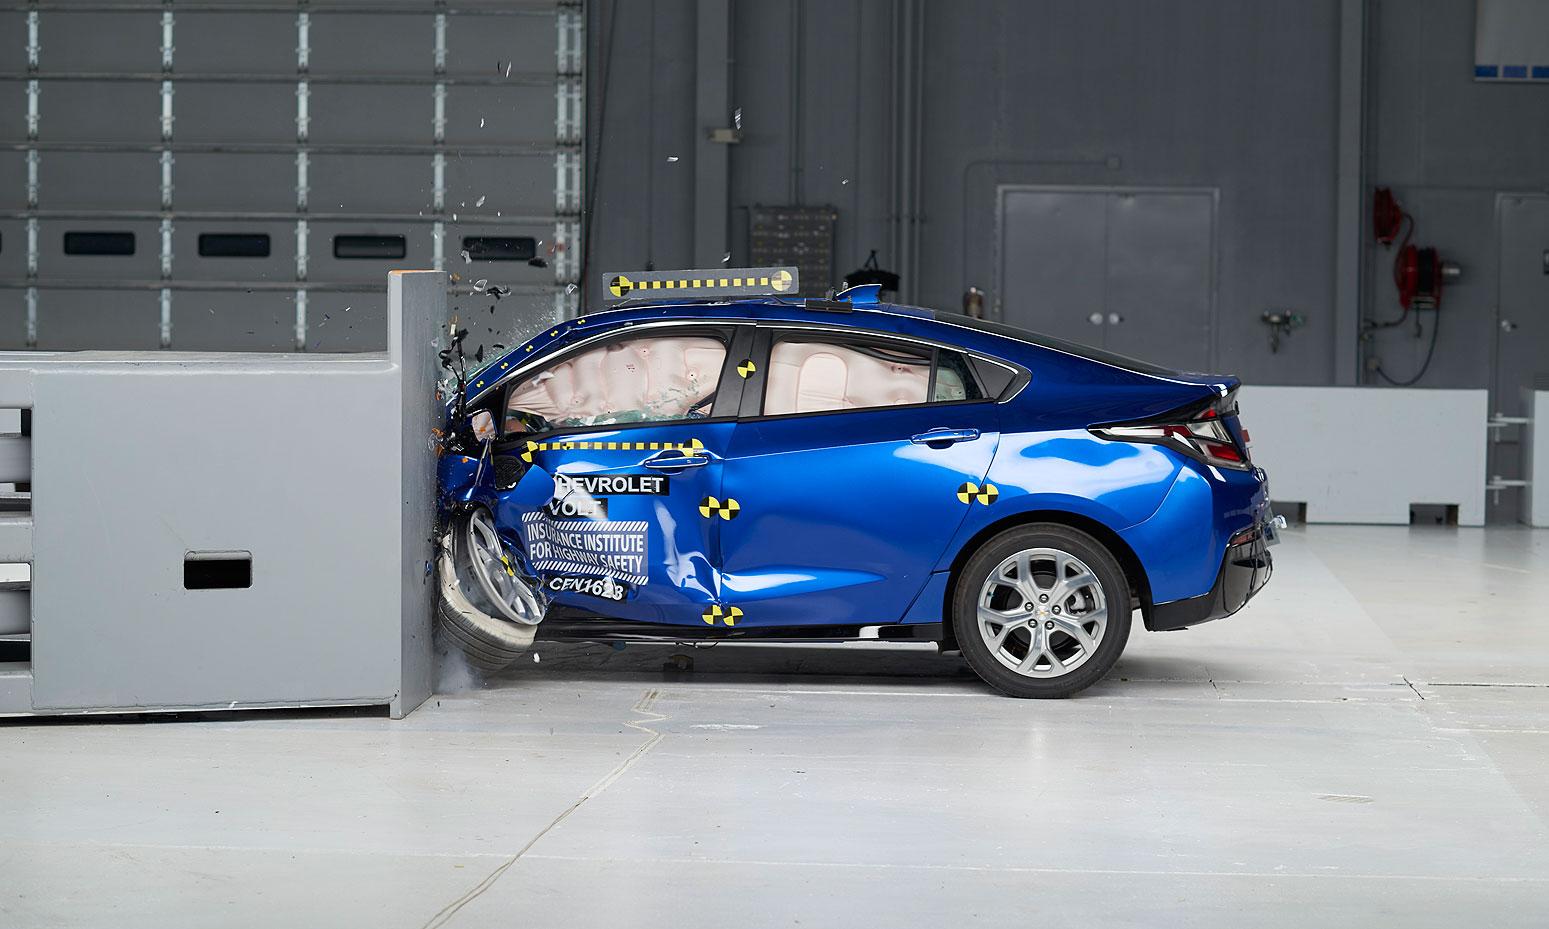 Tesla Model S Bmw I3 Fall Short Of Iihs Top Safety Pick Award